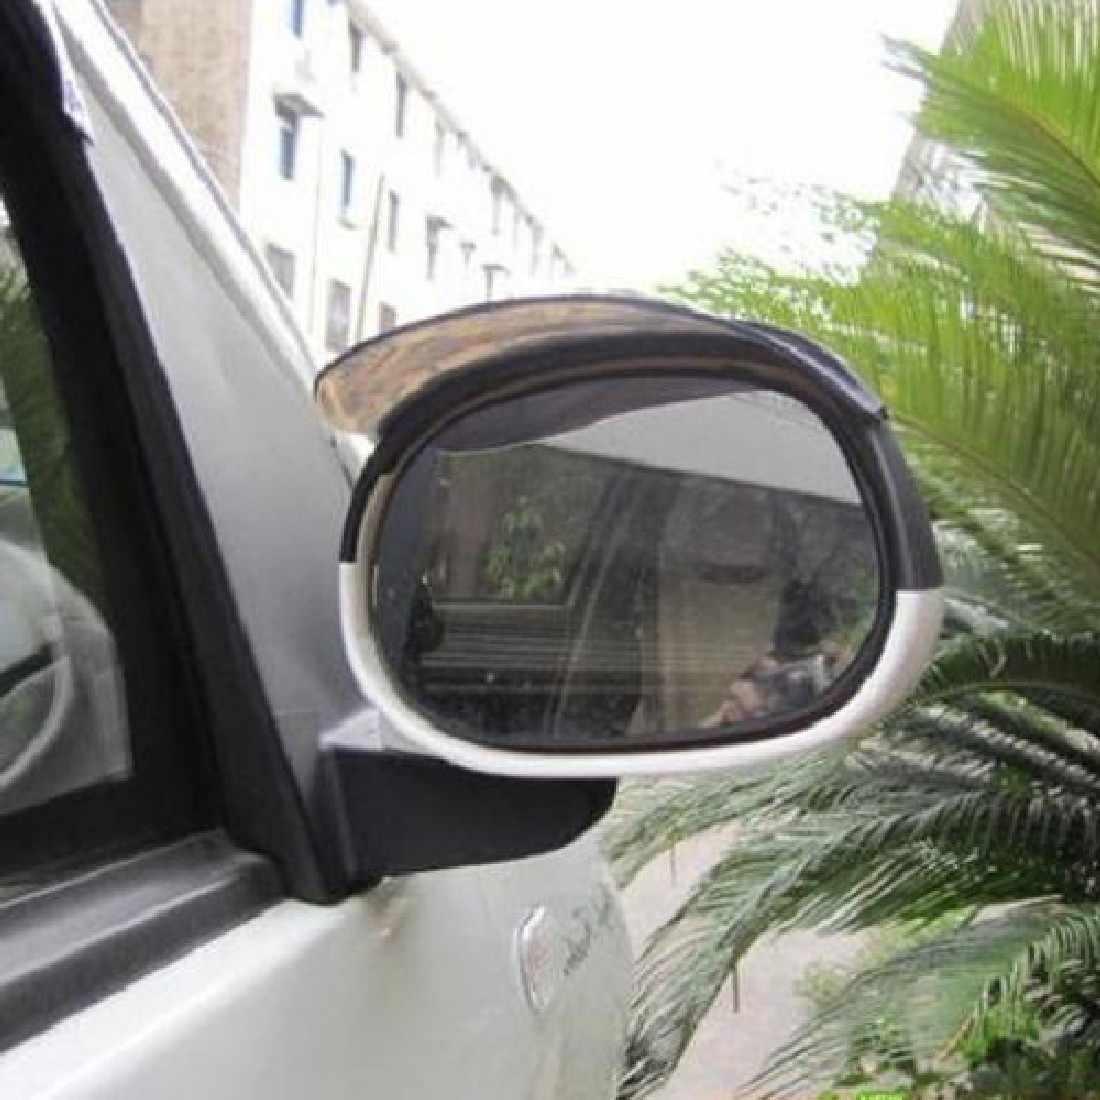 Penawaran Khusus Mobil Styling Hujan Alis untuk Lexus RX350 RX300 IS250 RX330 LX470 IS200 LX570 GX460 GX Ialah Lx Adalah IS350 LS460 SC430 G